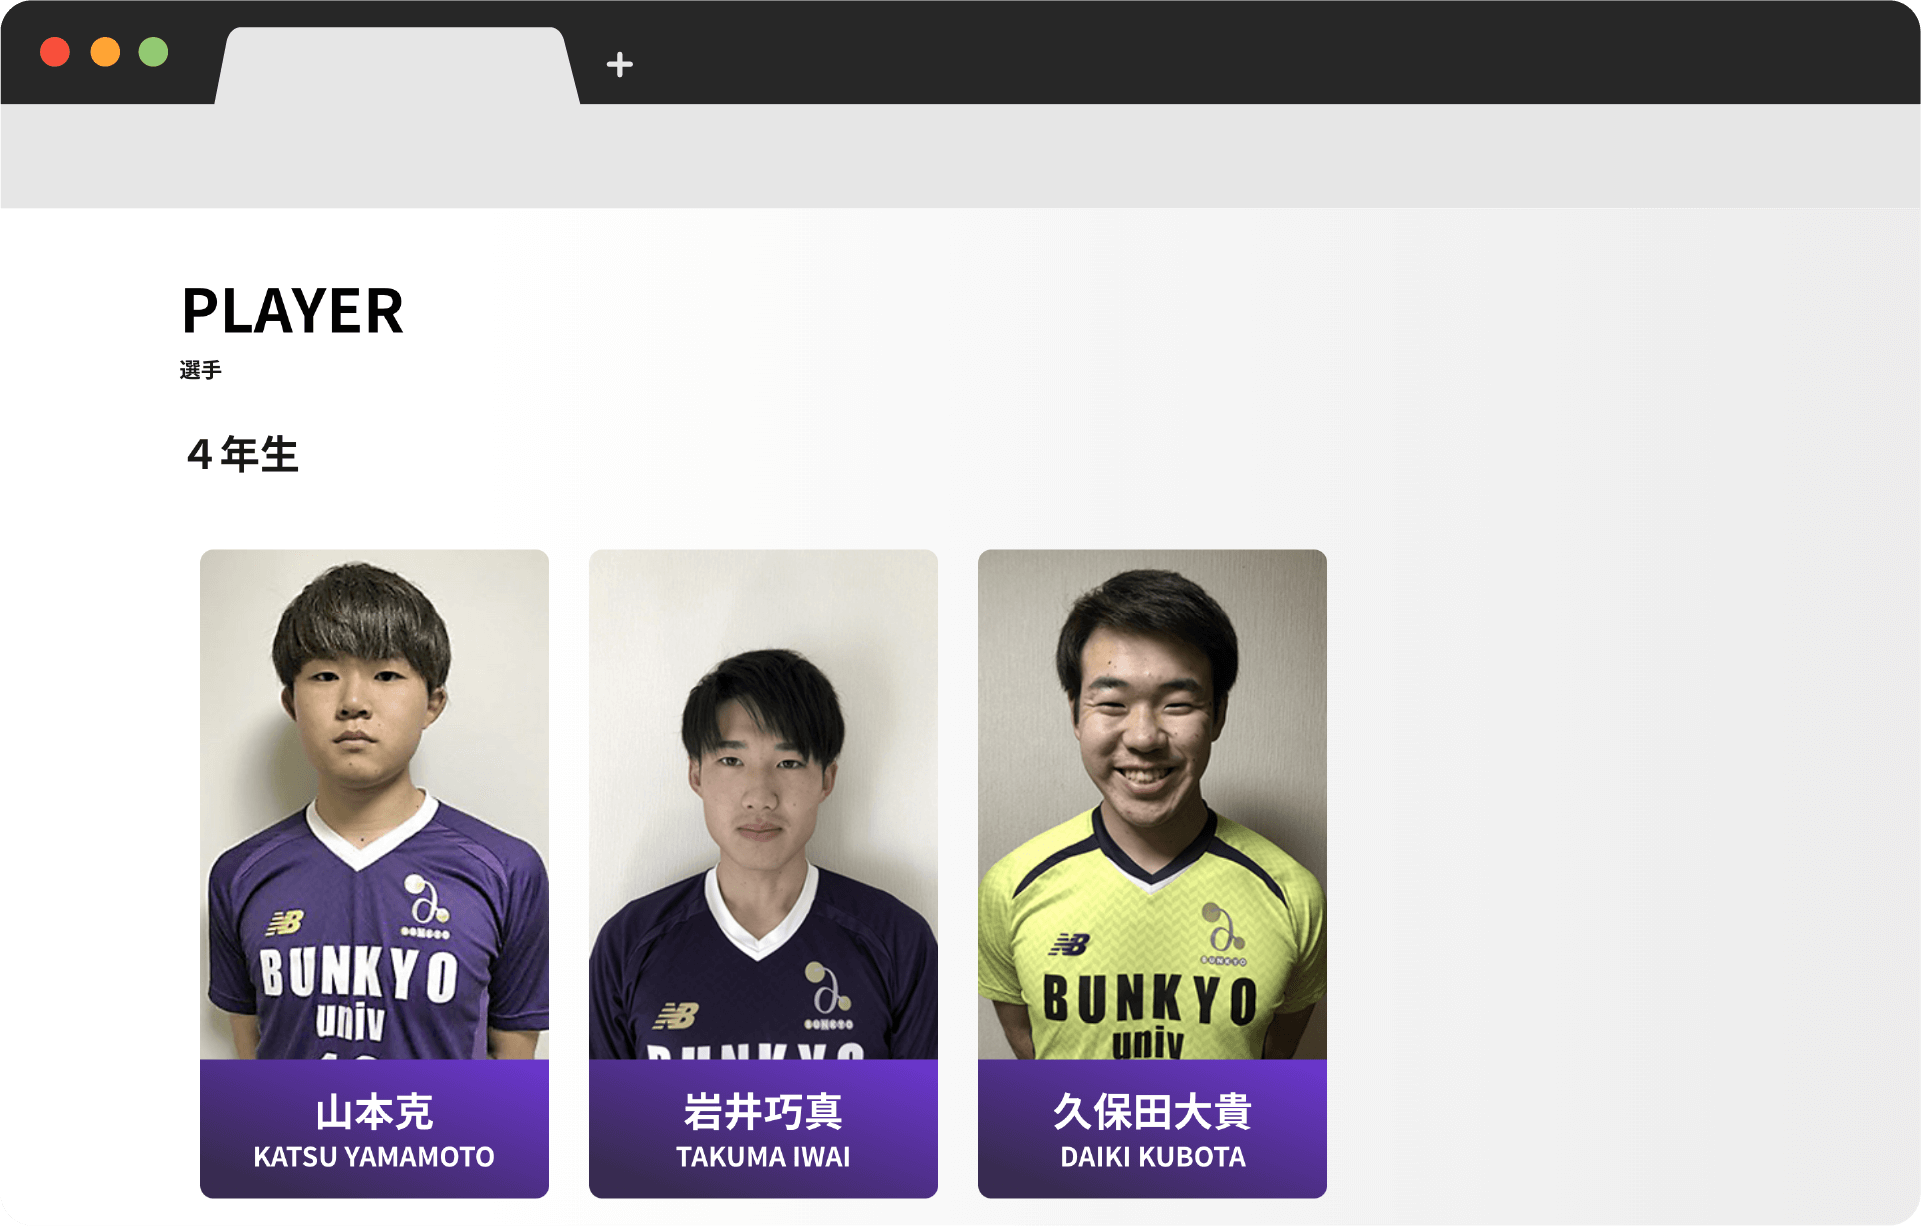 bunkyo-university-pc-003